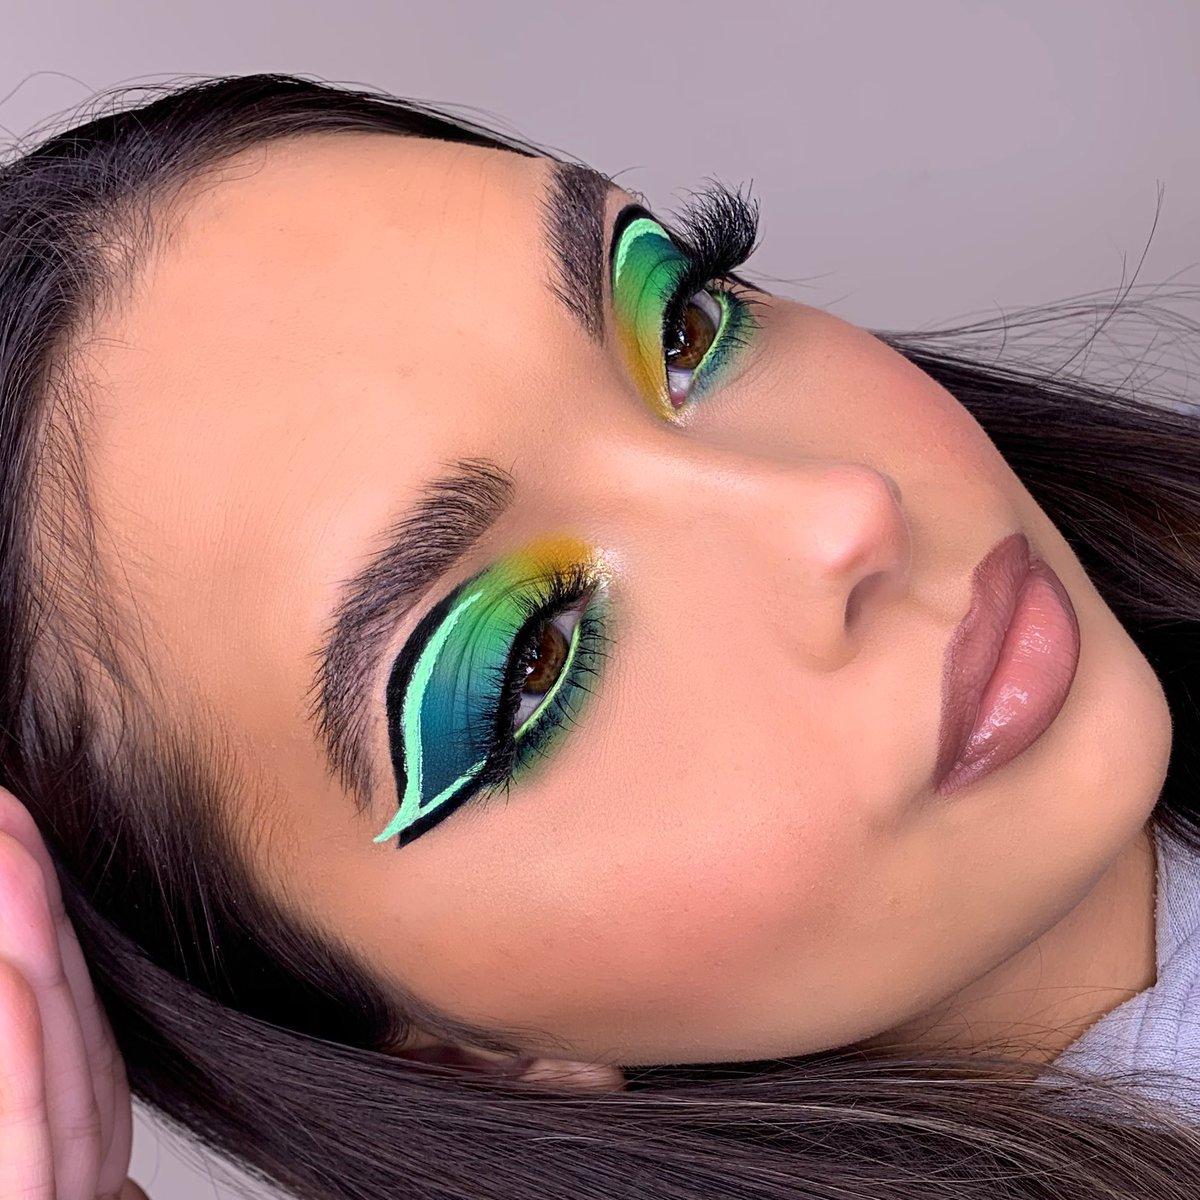 💚lets get graphic💚 @bperfectcosm xl carnival palette! #bperfect #pastelliner #xlcarnivalpette #makeup #makeupartist #makeuplooks